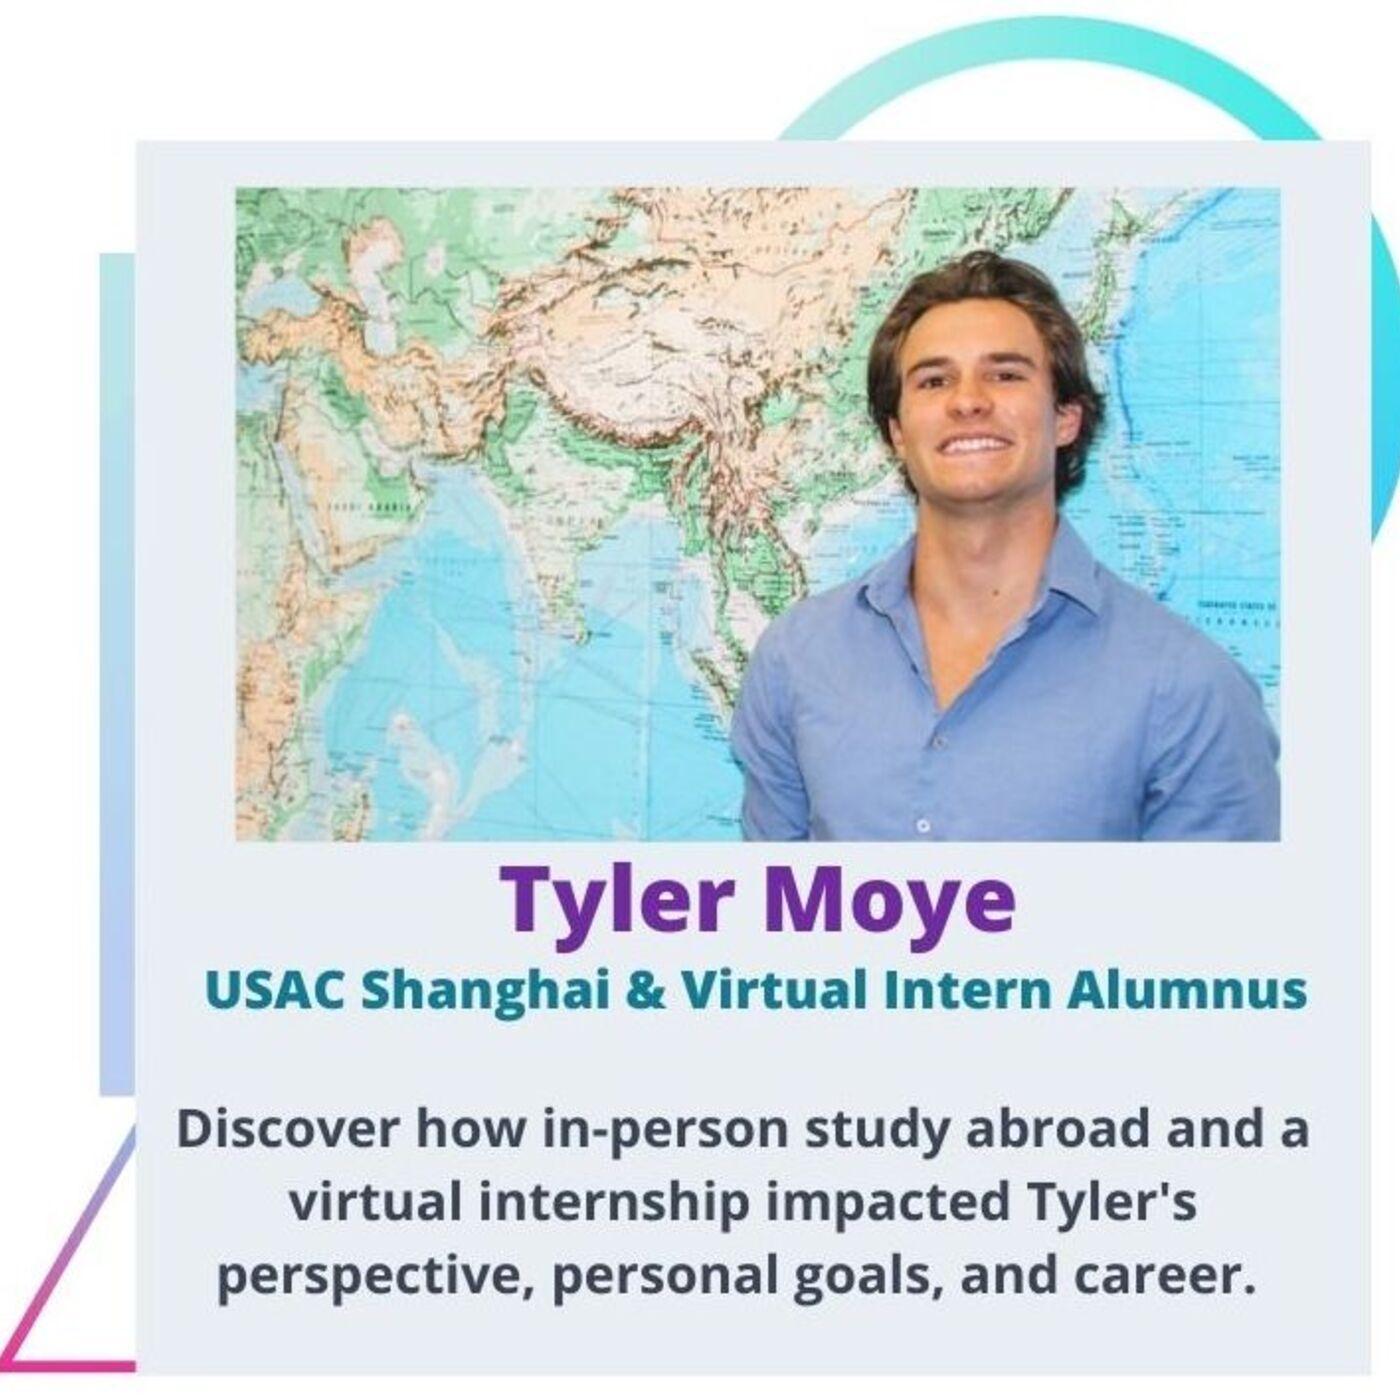 Season 3, Ep. 2 - Alumni Reflection: International Experiences Lead to Career Opportunities